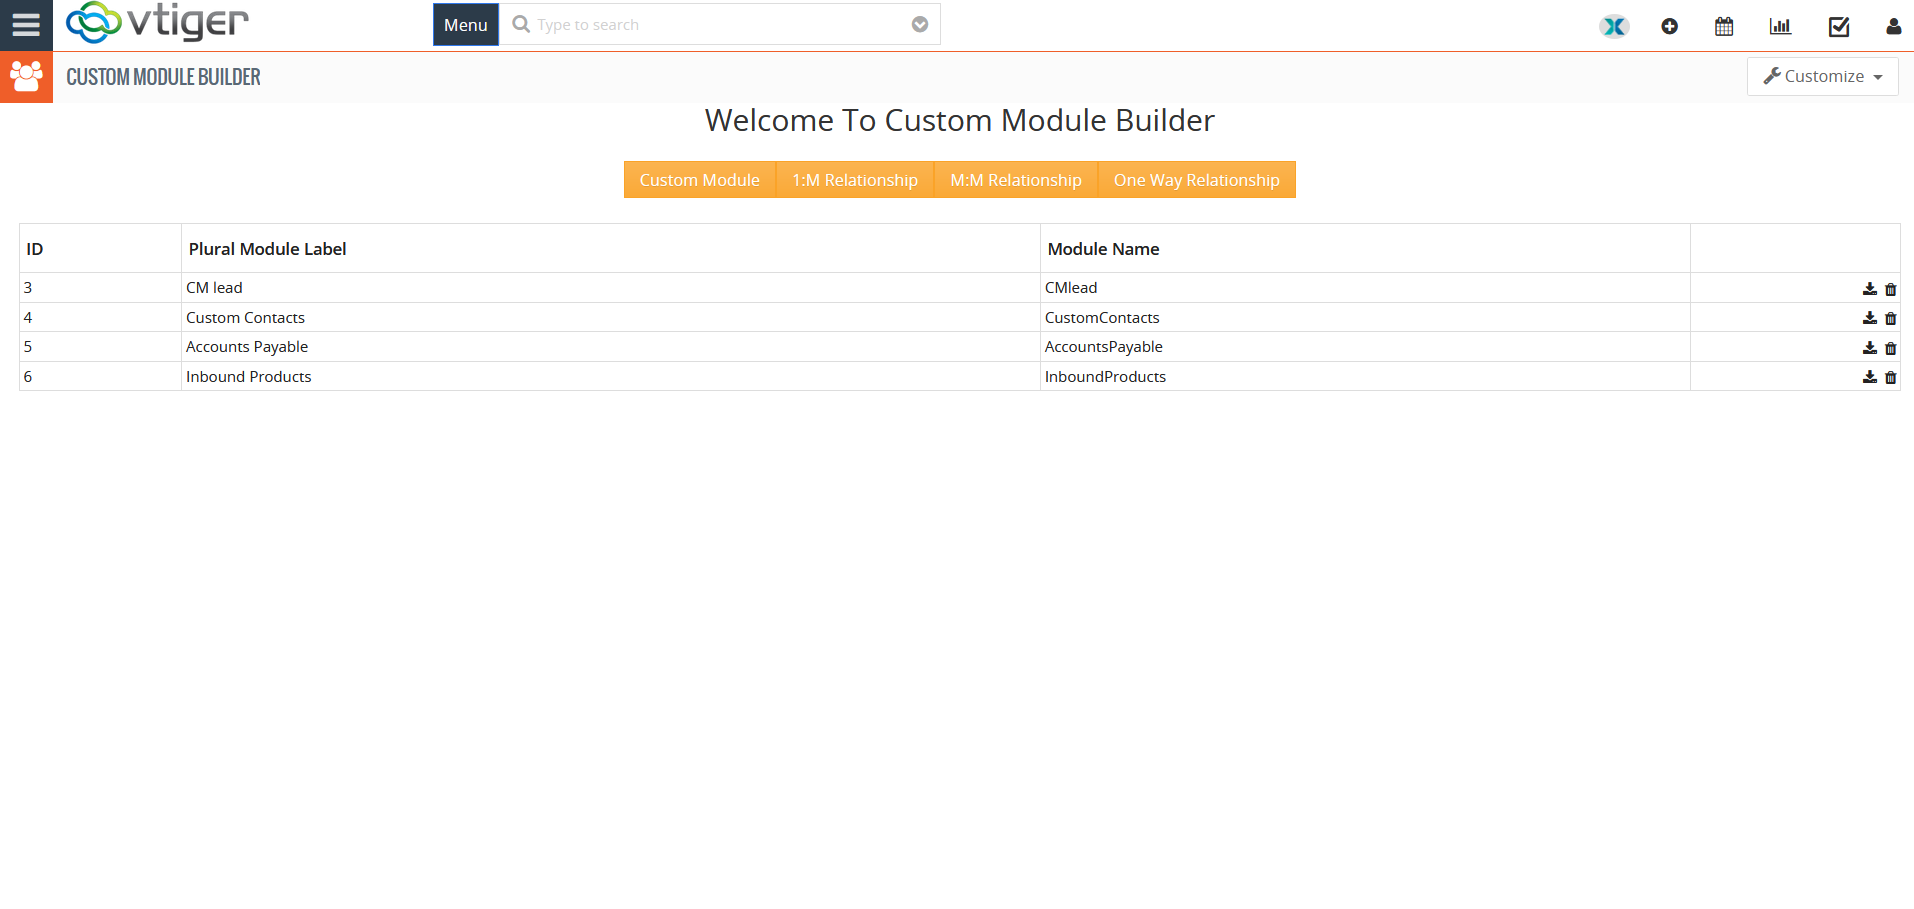 Custom Module builder configuration